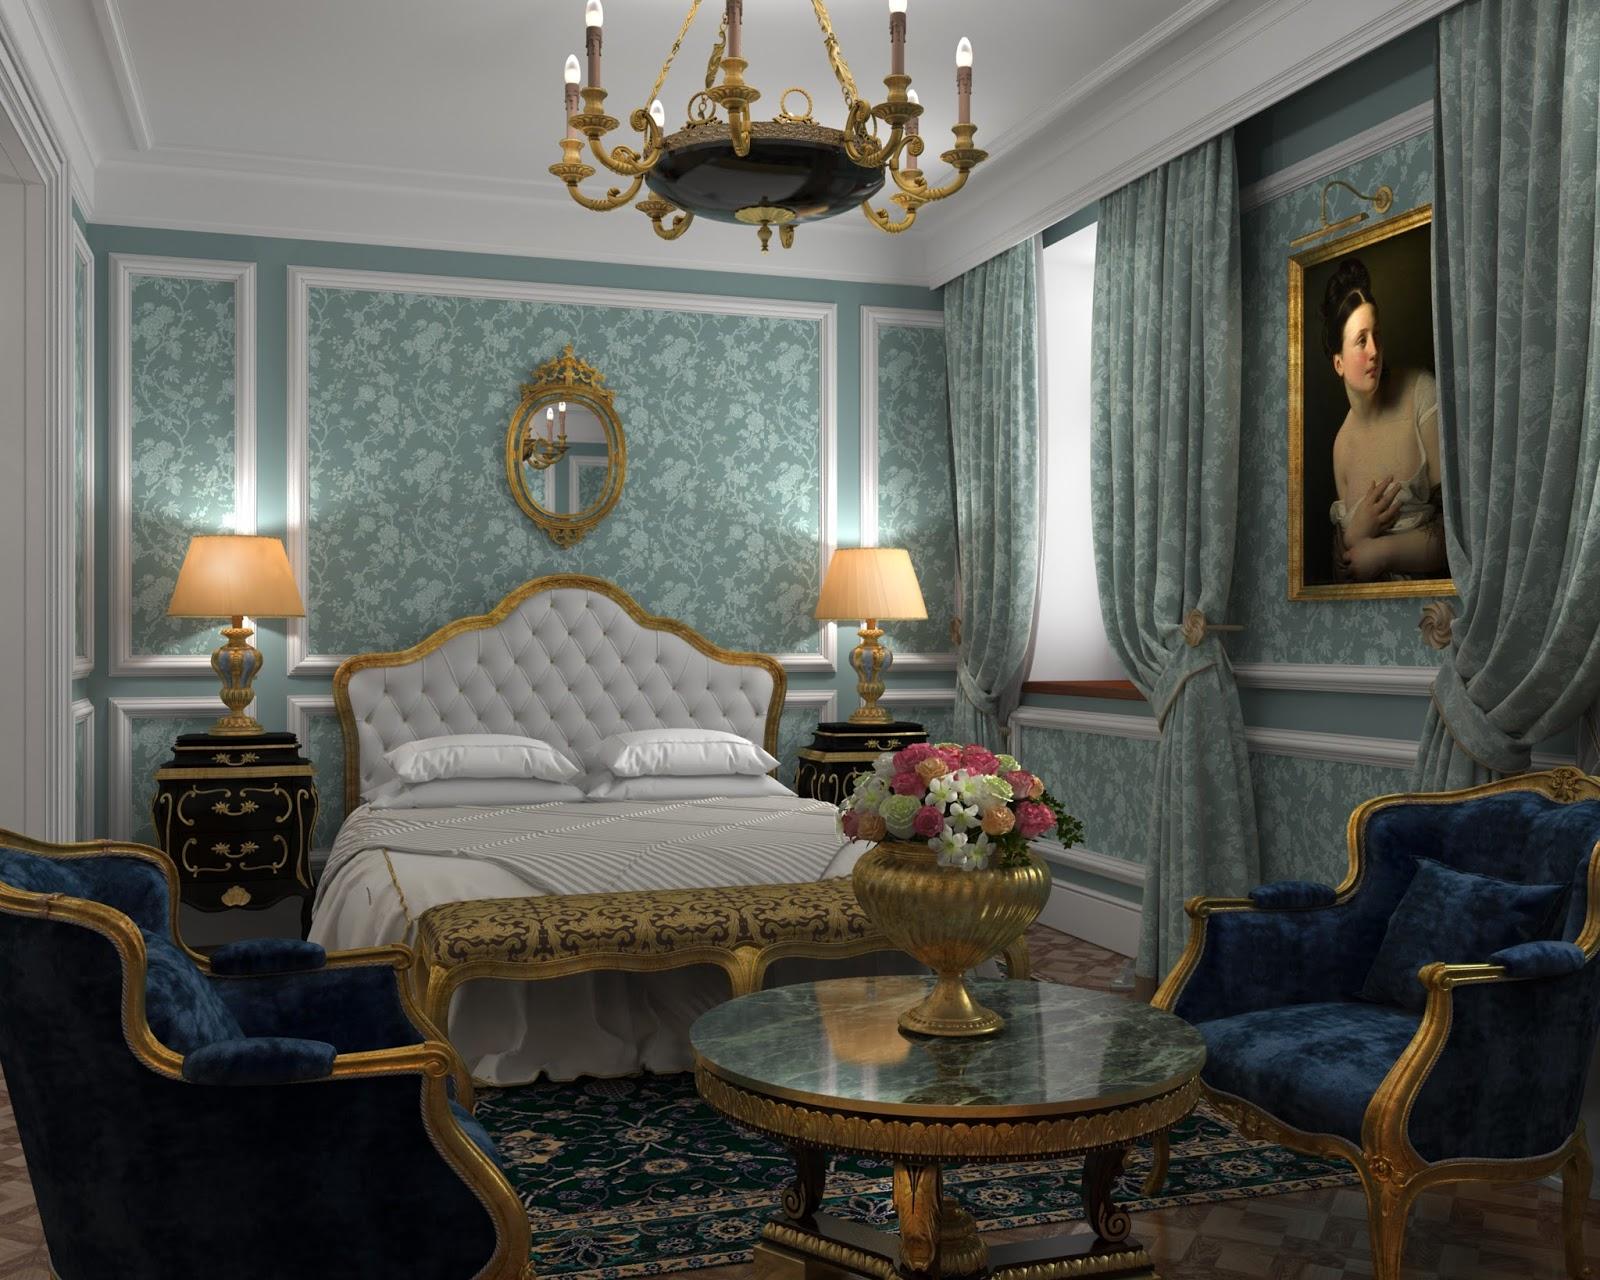 Darya girina interior design march 2015 - The Second Option For Bedroom